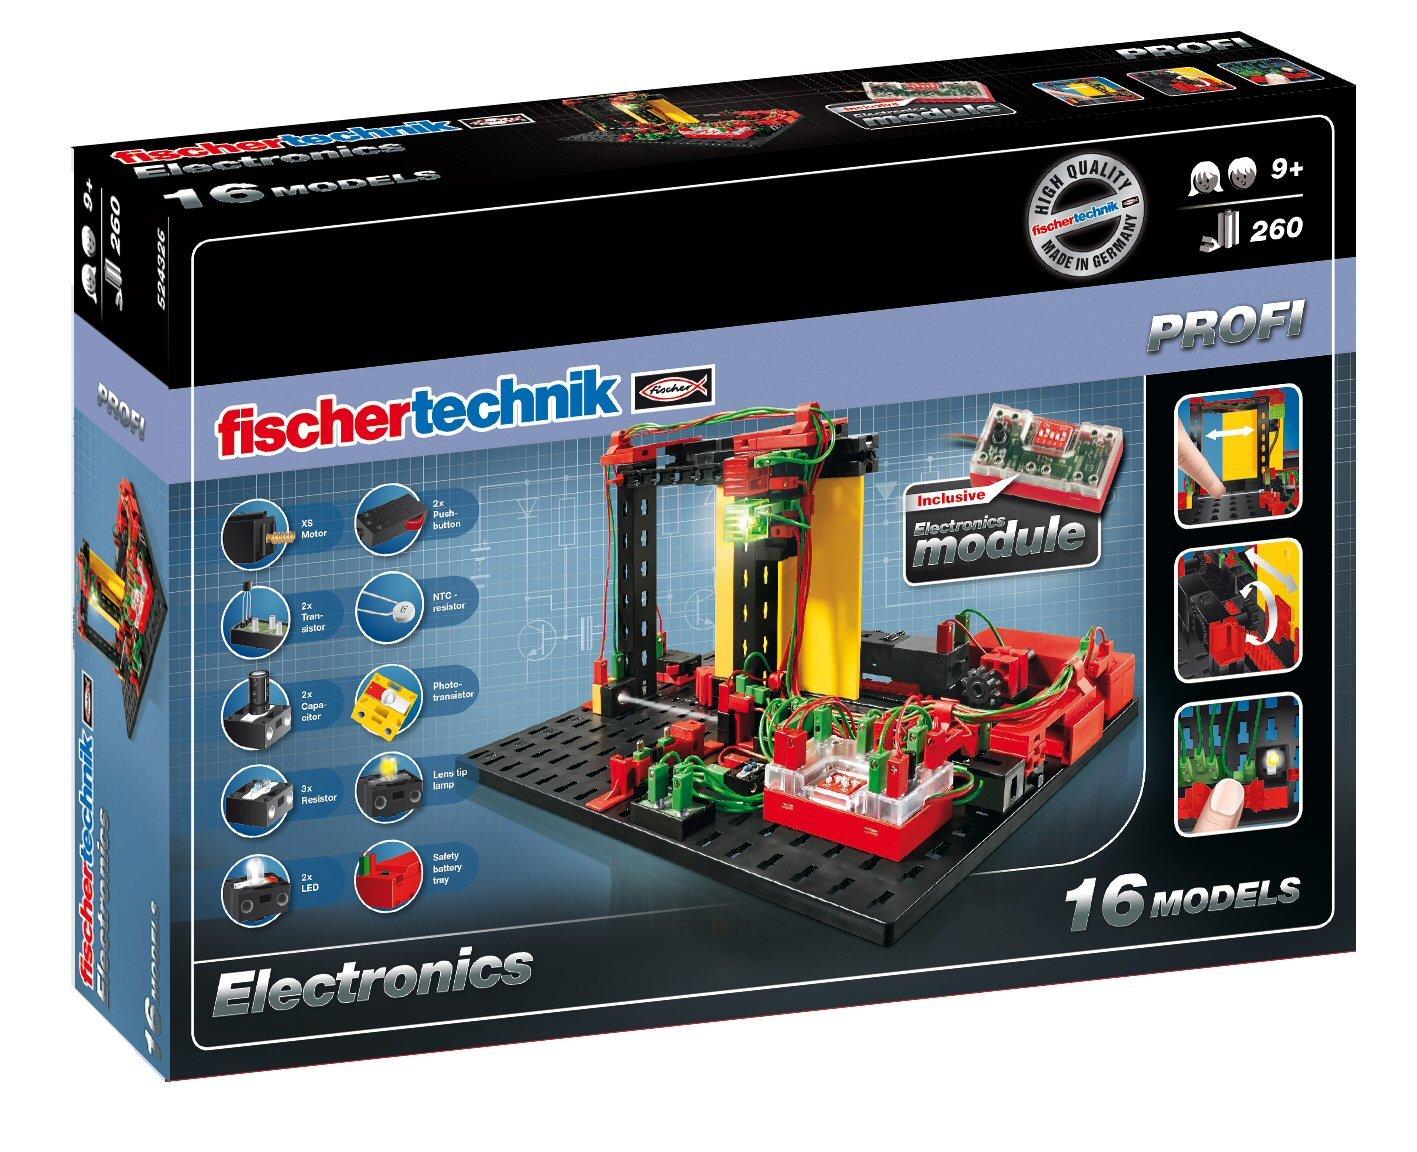 Fischertechnik Electronics Set Toys Games Amazoncom Snap Circuits Sound Discovery Kit